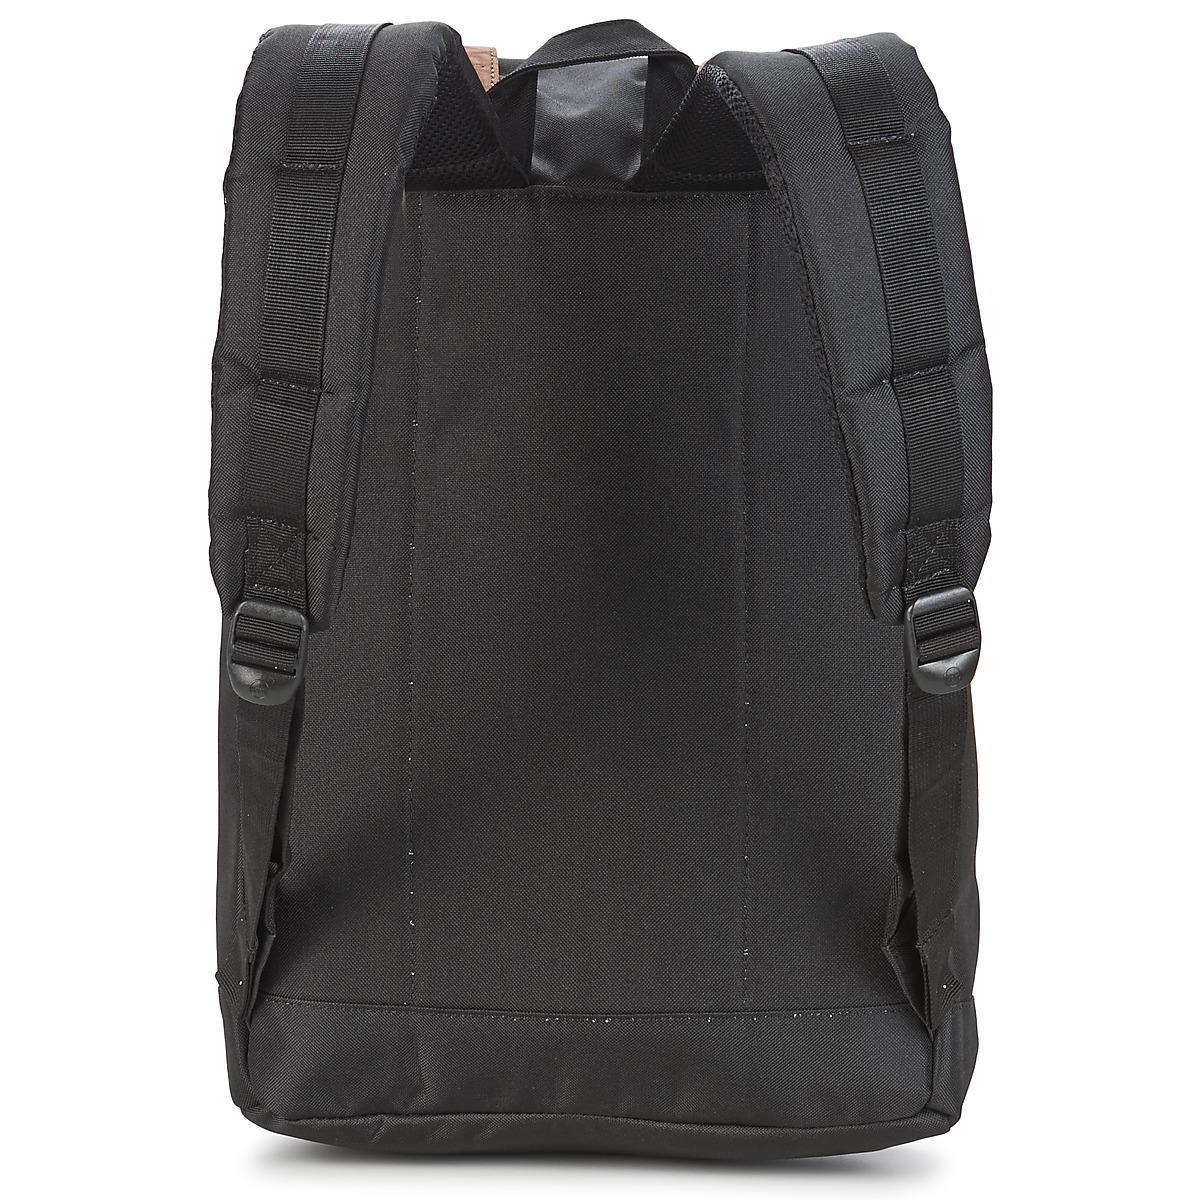 Herschel Supply Co. Synthetic Retreat Straps Backpack Rucksack Bag Men's Backpack In Black - Save 16%